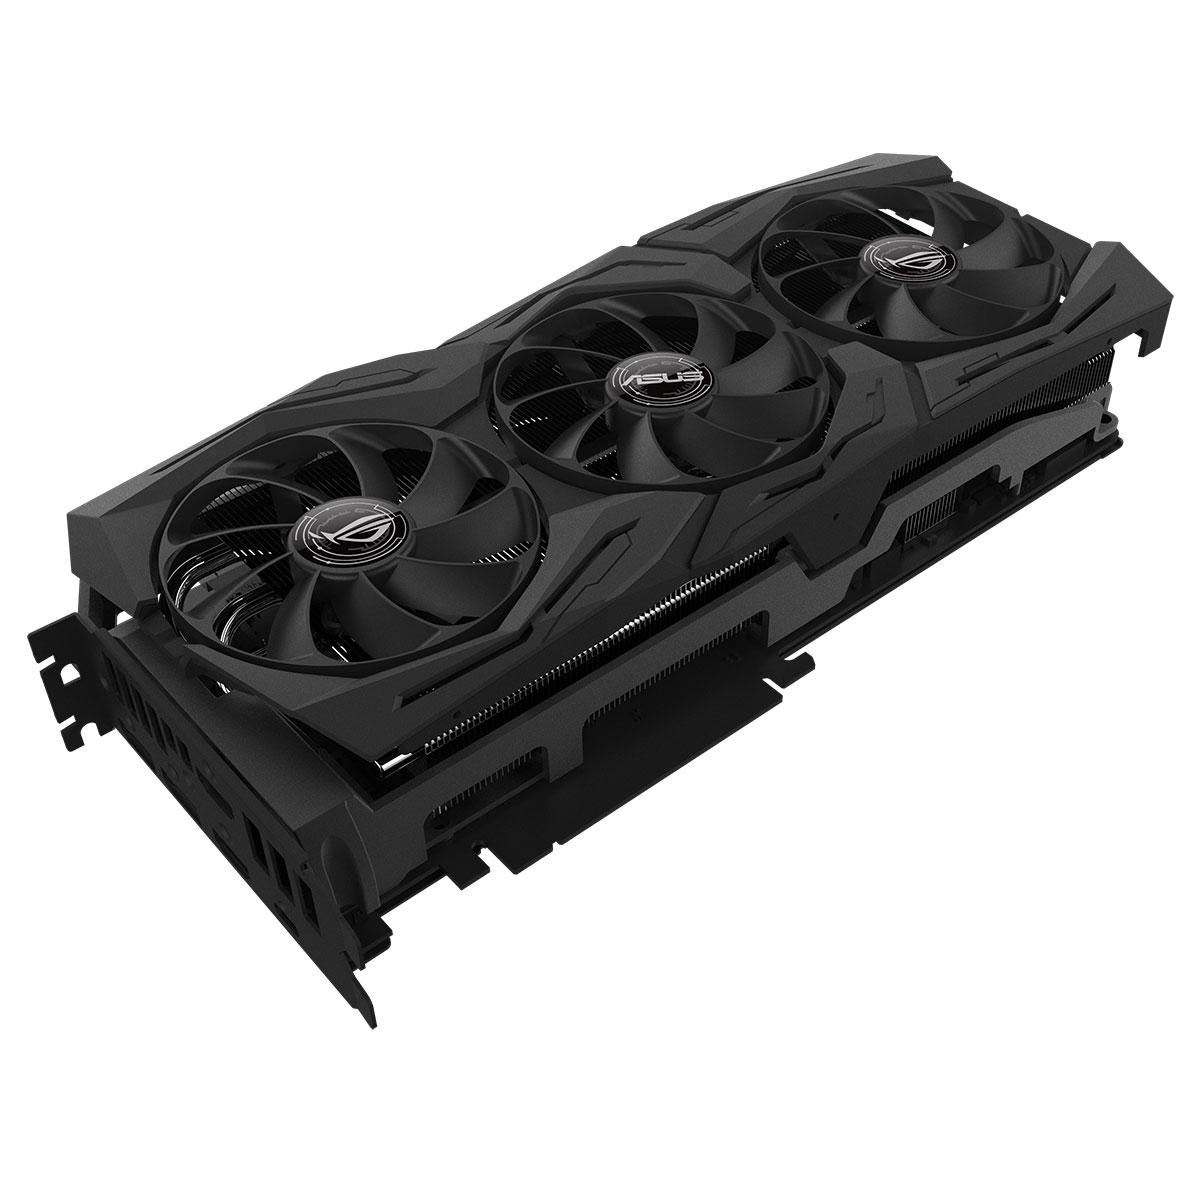 Asus GeForce ROG STRIX-RTX2080-O8G-GAMING (90YV0C60-M0NM00) - Achat / Vente Carte graphique sur Cybertek.fr - 2